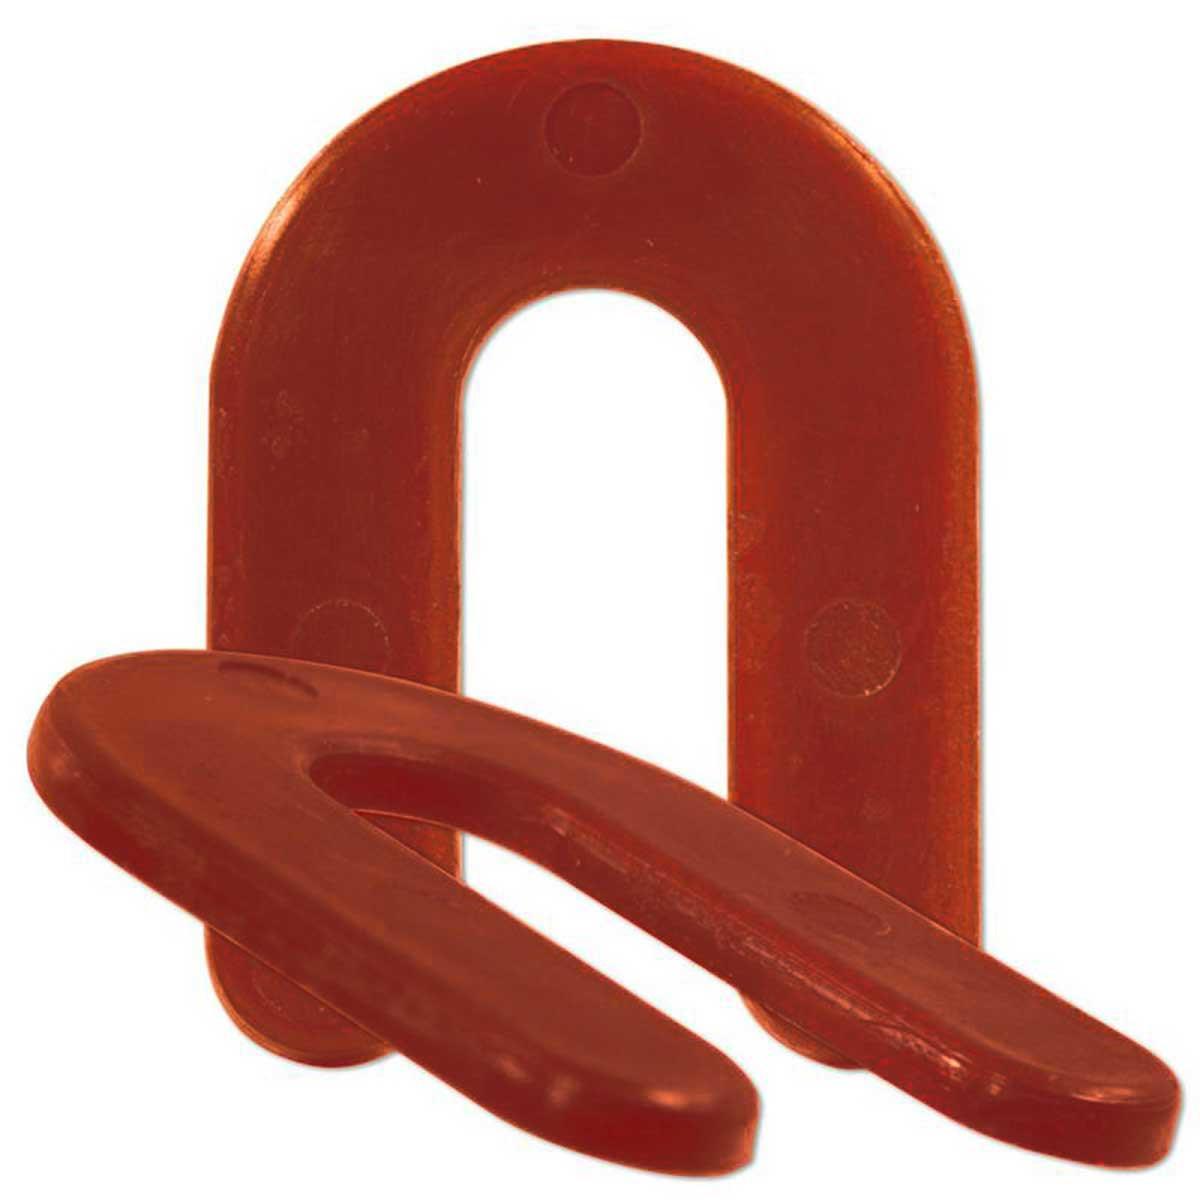 Curtain Wall Shims : Cd products horseshoe shims pcs box contractors direct